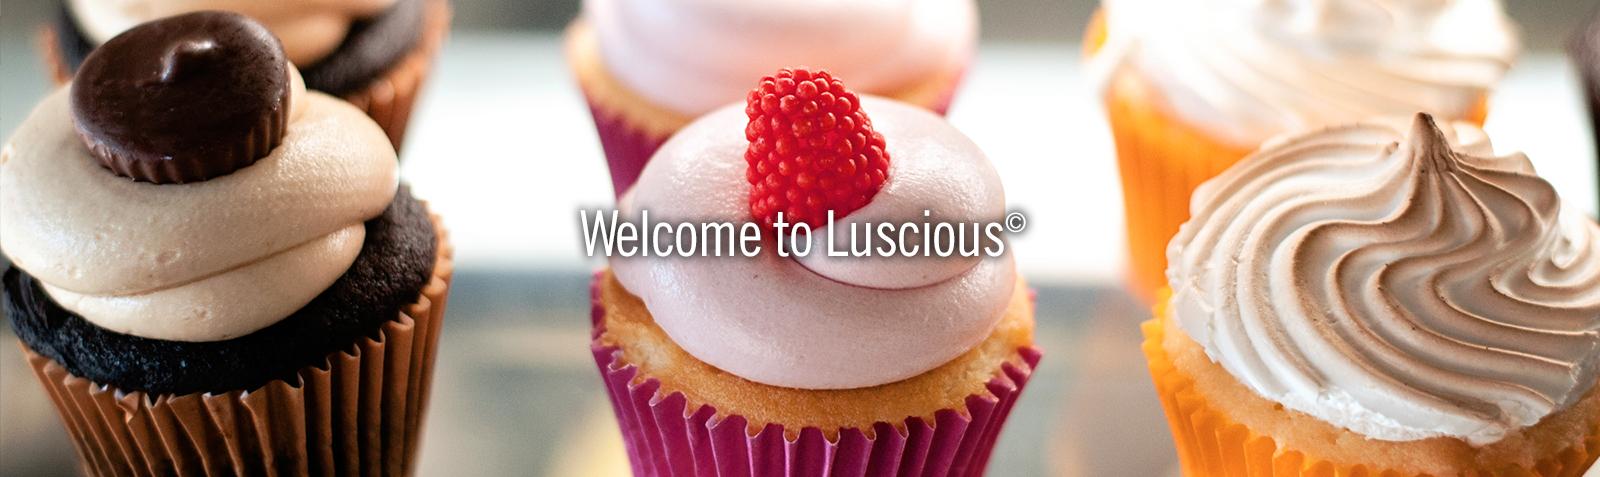 Slider3_cupcakes